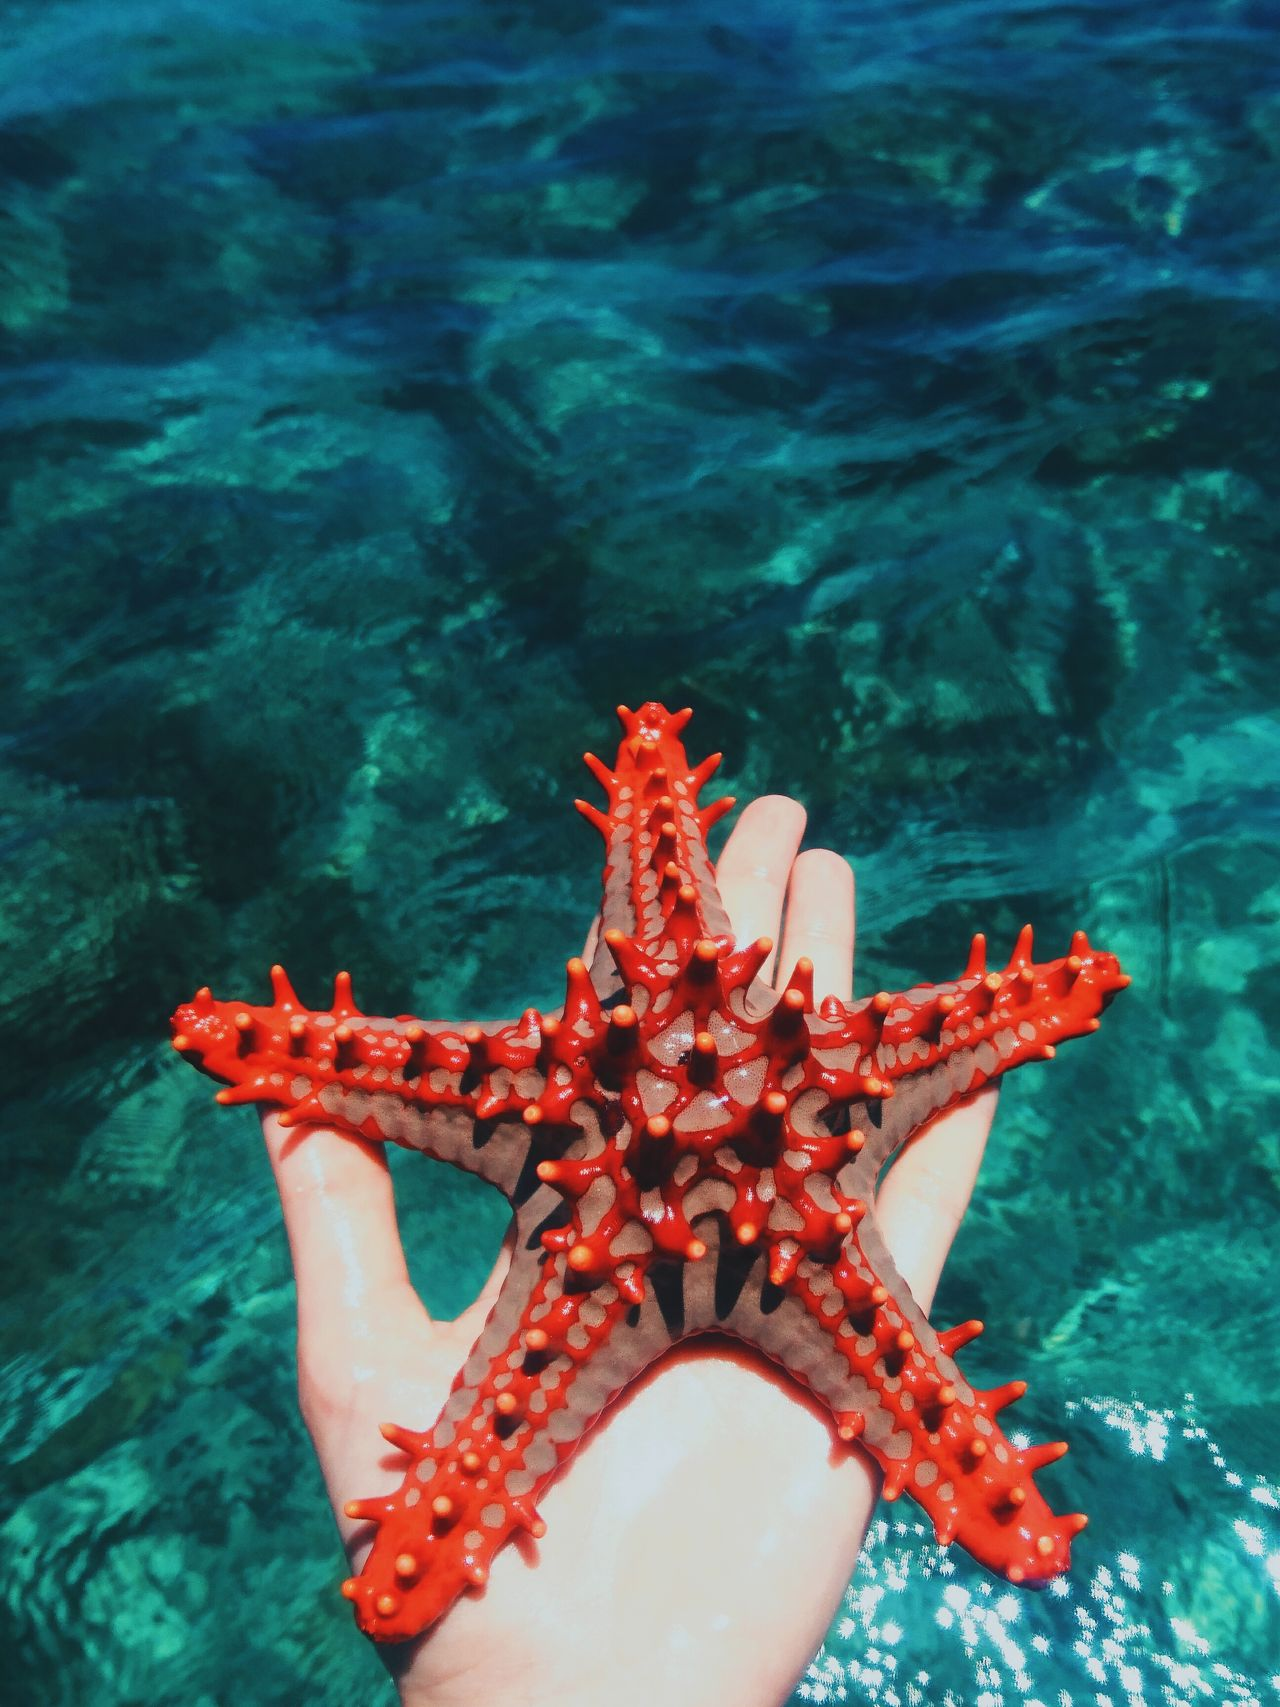 Water Sea Life Starfish  Underwater Beauty In Nature Nature Close-up Ocean Adventure VSCO Kenya EyeEm Best Edits Africa EyeEm Best Shots Travel Travel Destinations Minimal